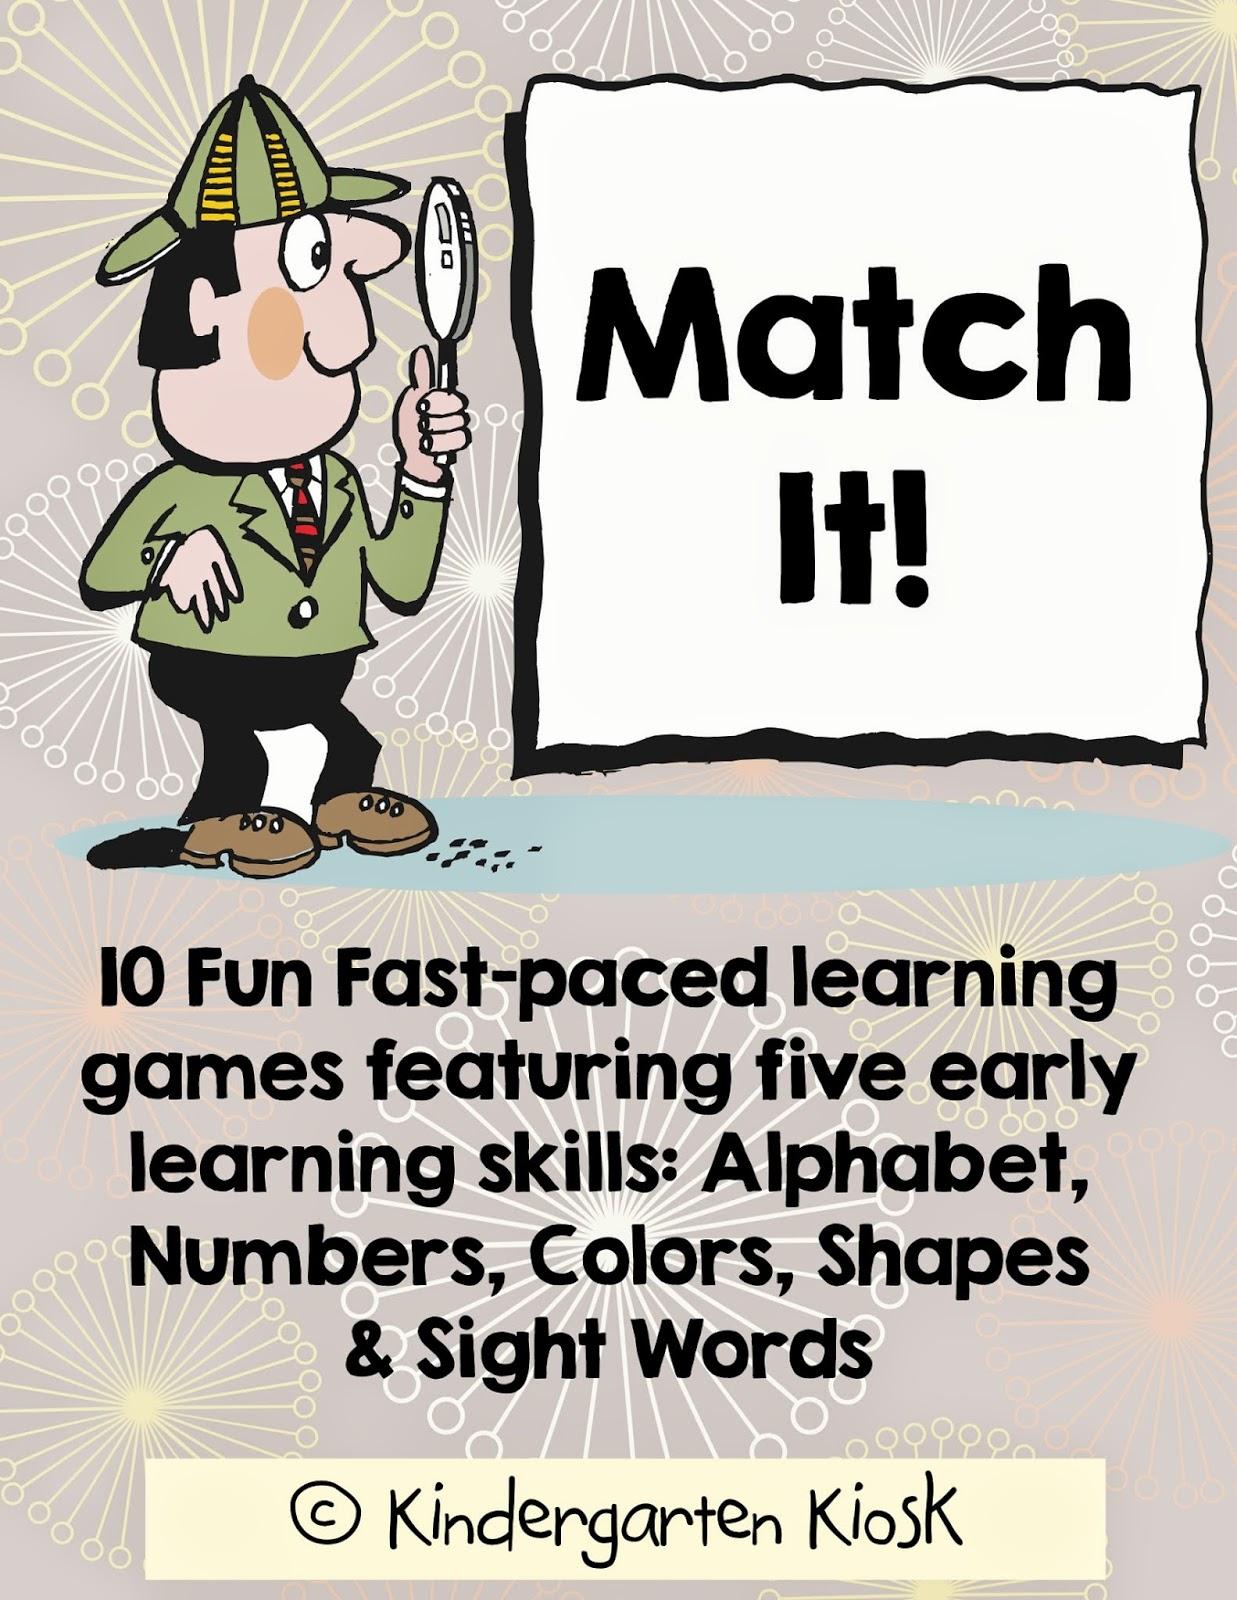 Kindergarten Kiosk Ten Early Learning Games